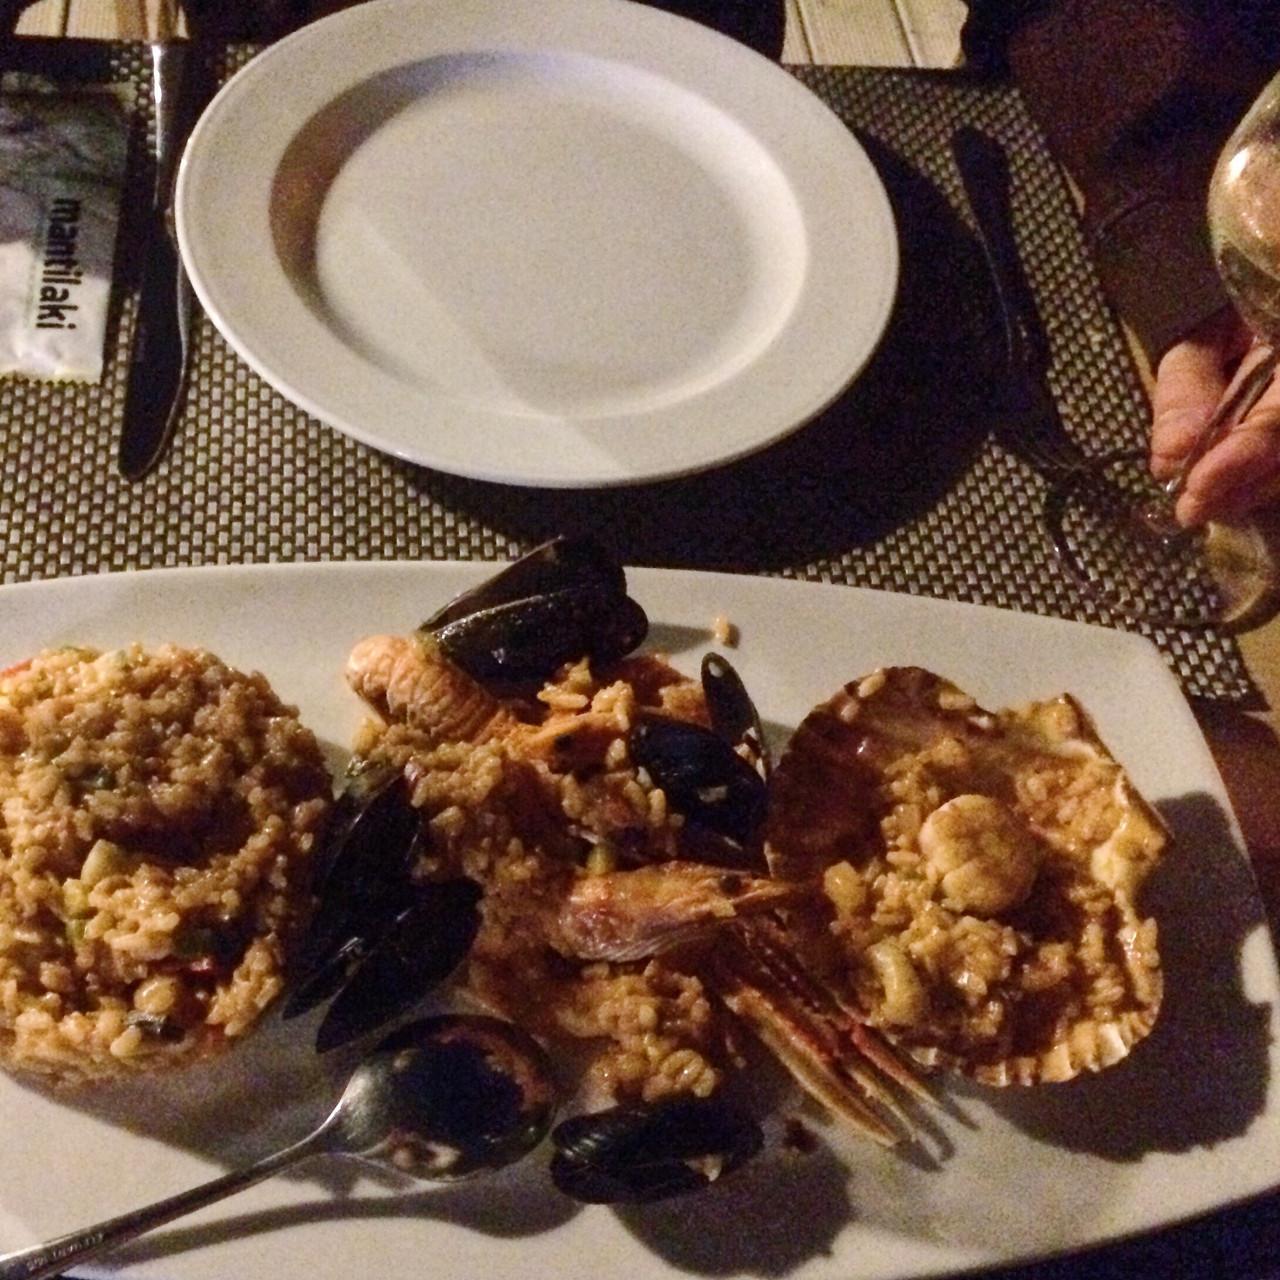 Seafood risotto at Aegaen Safari restaurant in Perivolos, Santorini, Greece